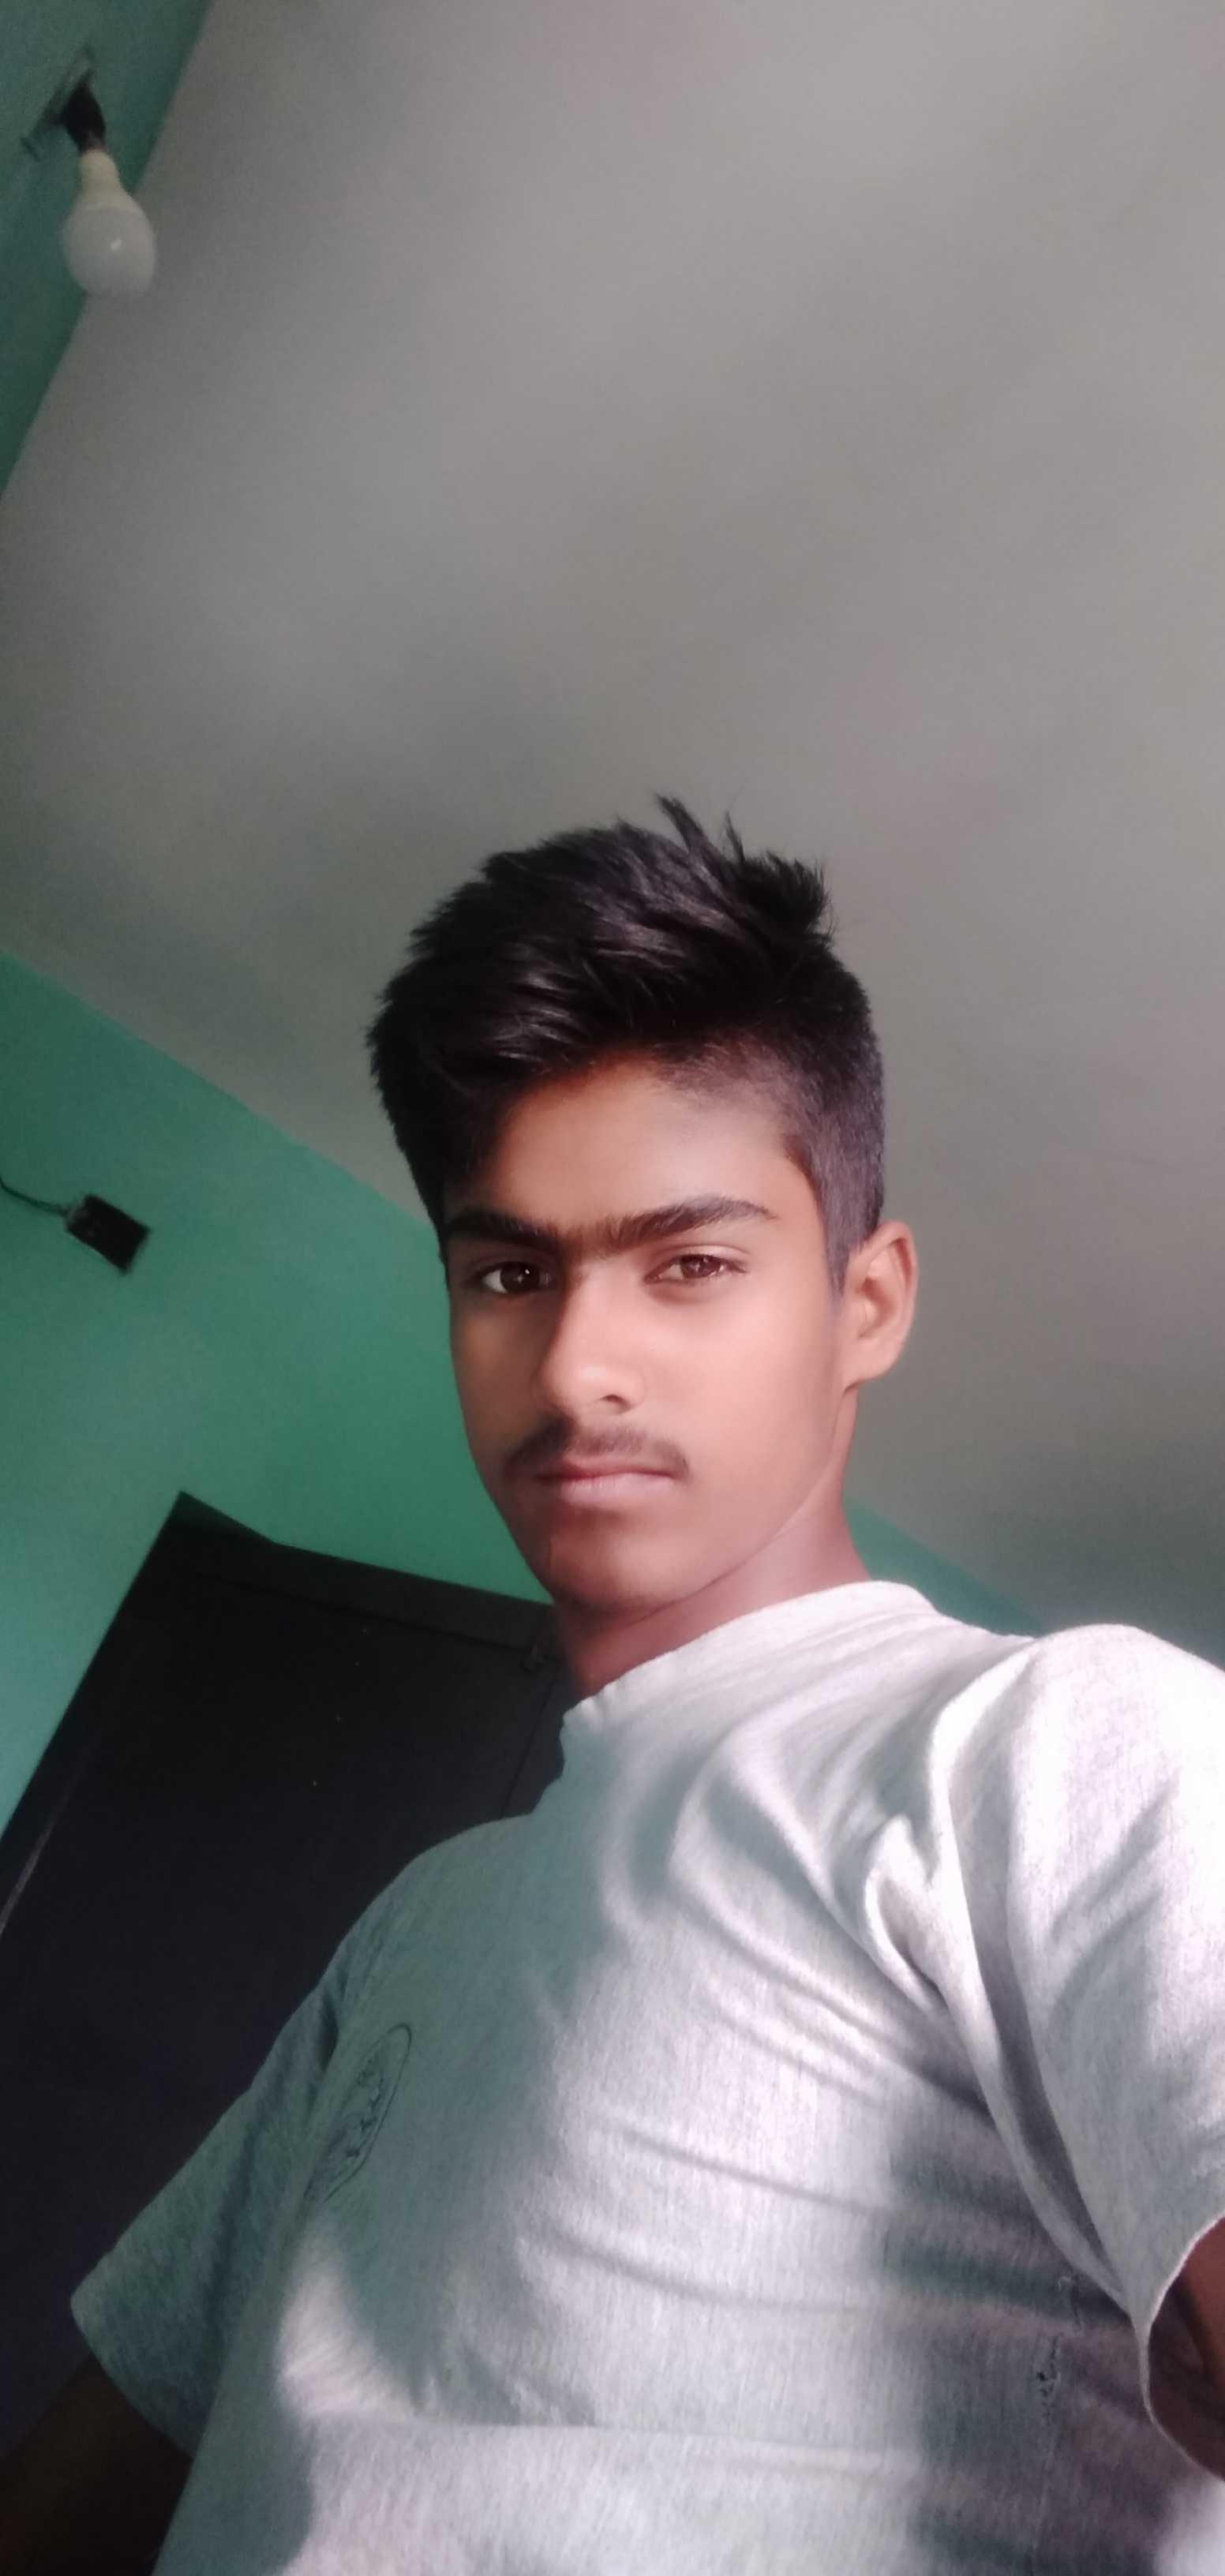 ahabub rahman Profile Picture